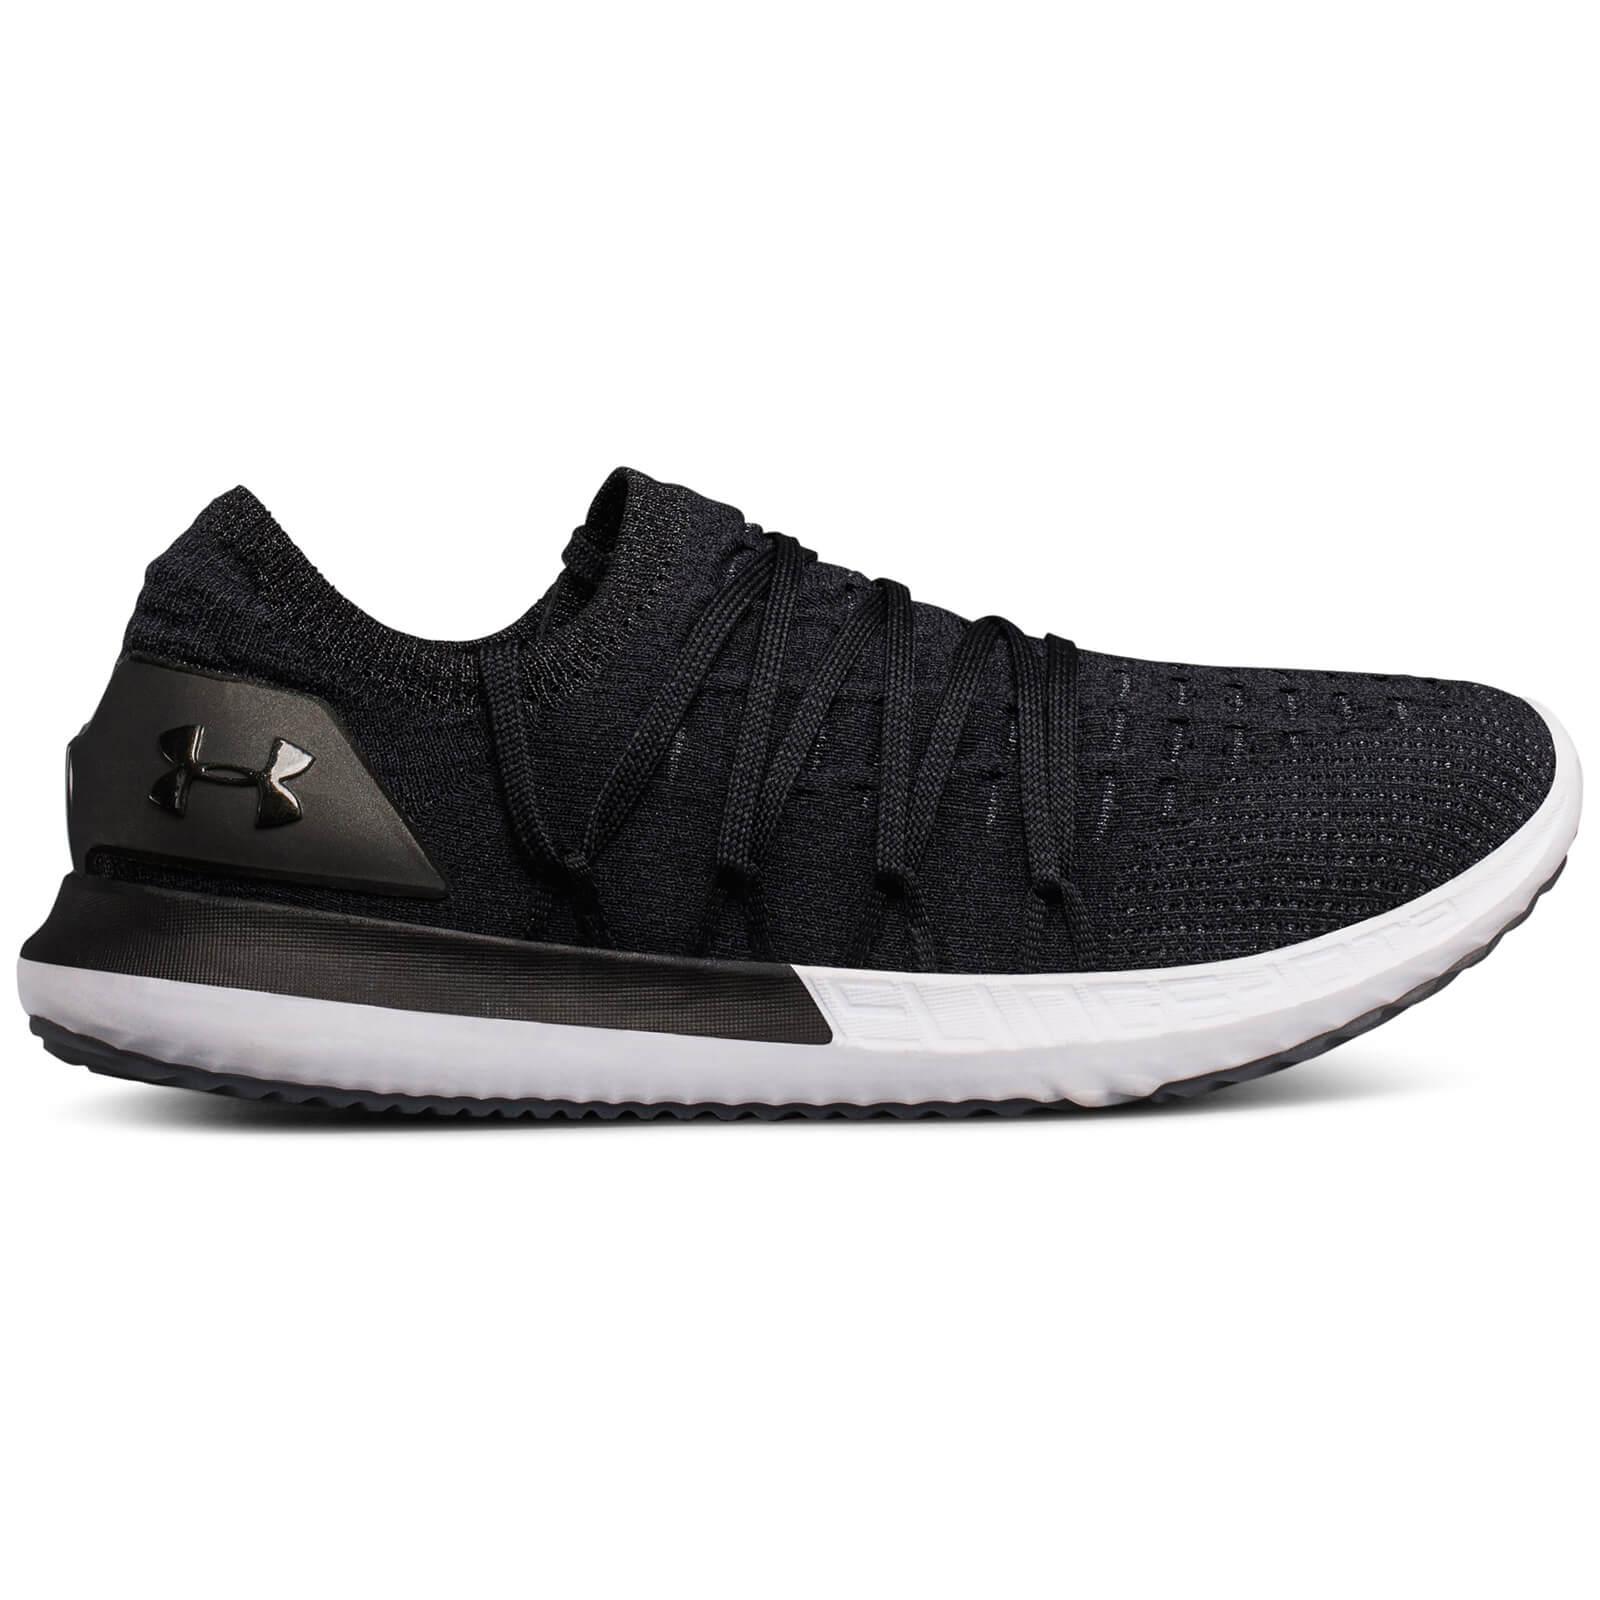 Under Armour Women's Speedform Slingshot 2 Running Shoes - Black - US 7.5/UK 5 - Black